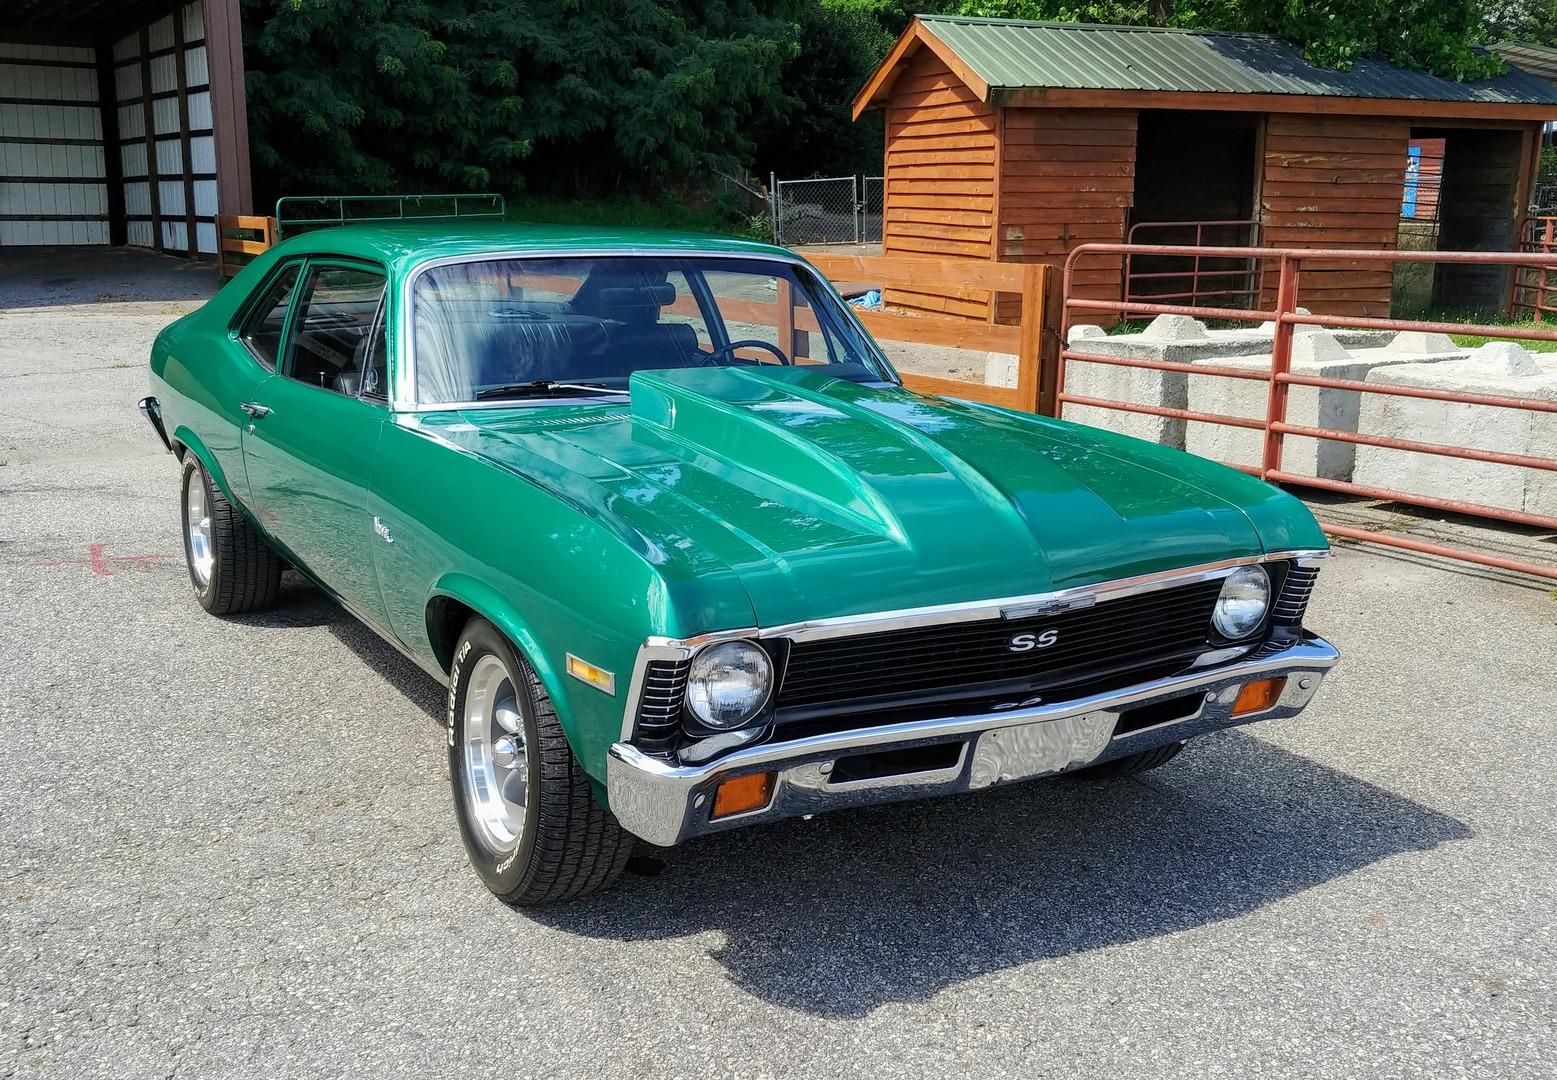 Used 1972 Chevrolet Nova -SMALL BLOCK TURN KEY MUSCLE CAR | Mundelein, IL